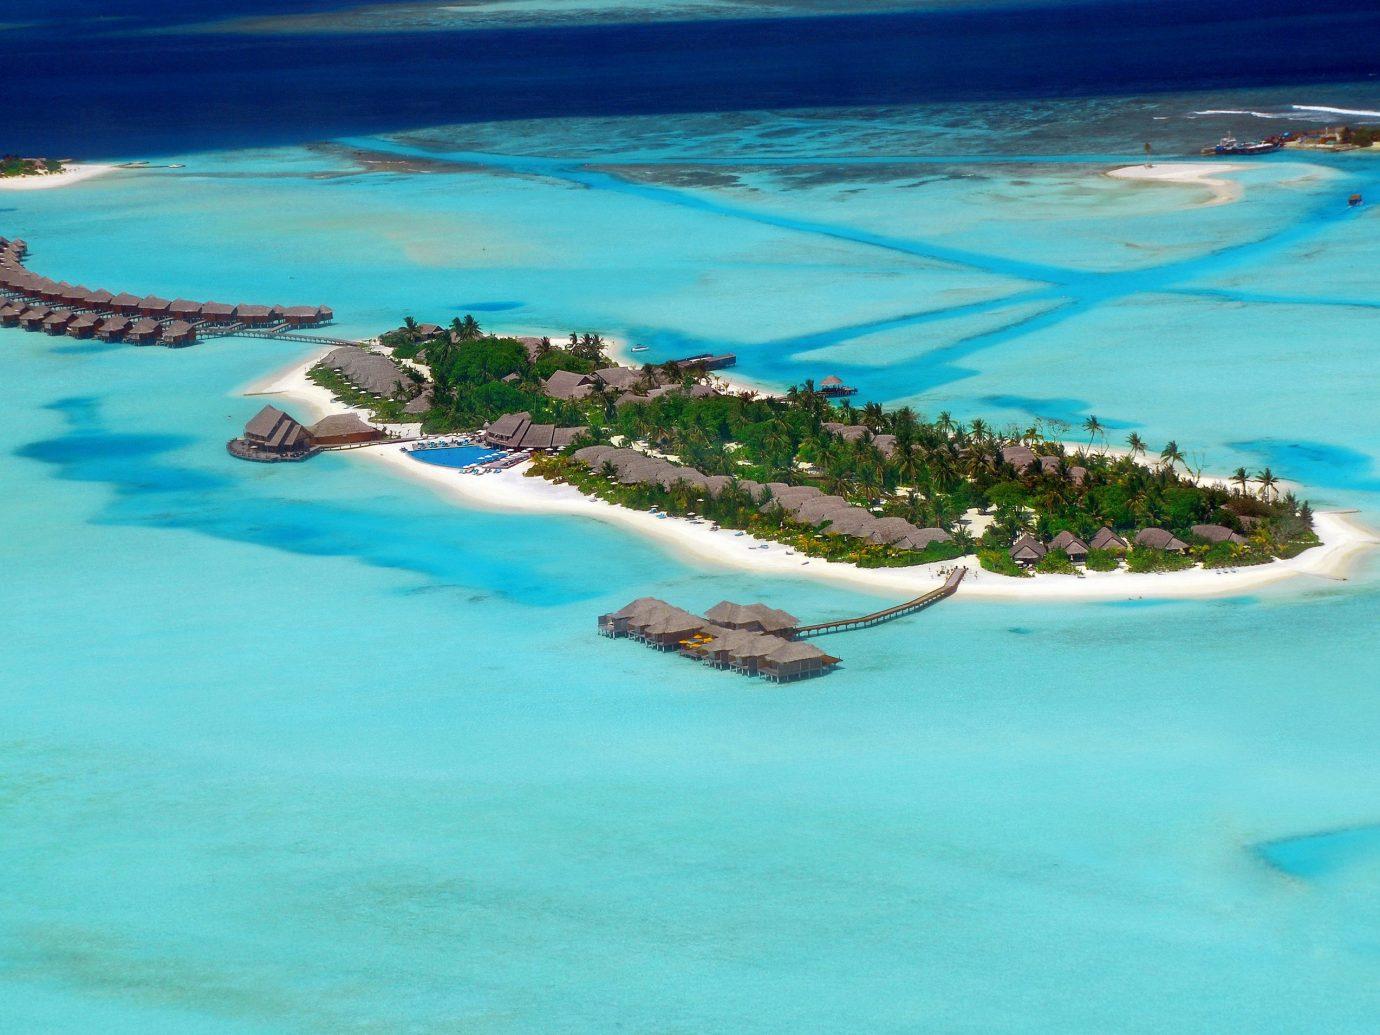 Aerial view of Anantara Dhigu Maldives Resort